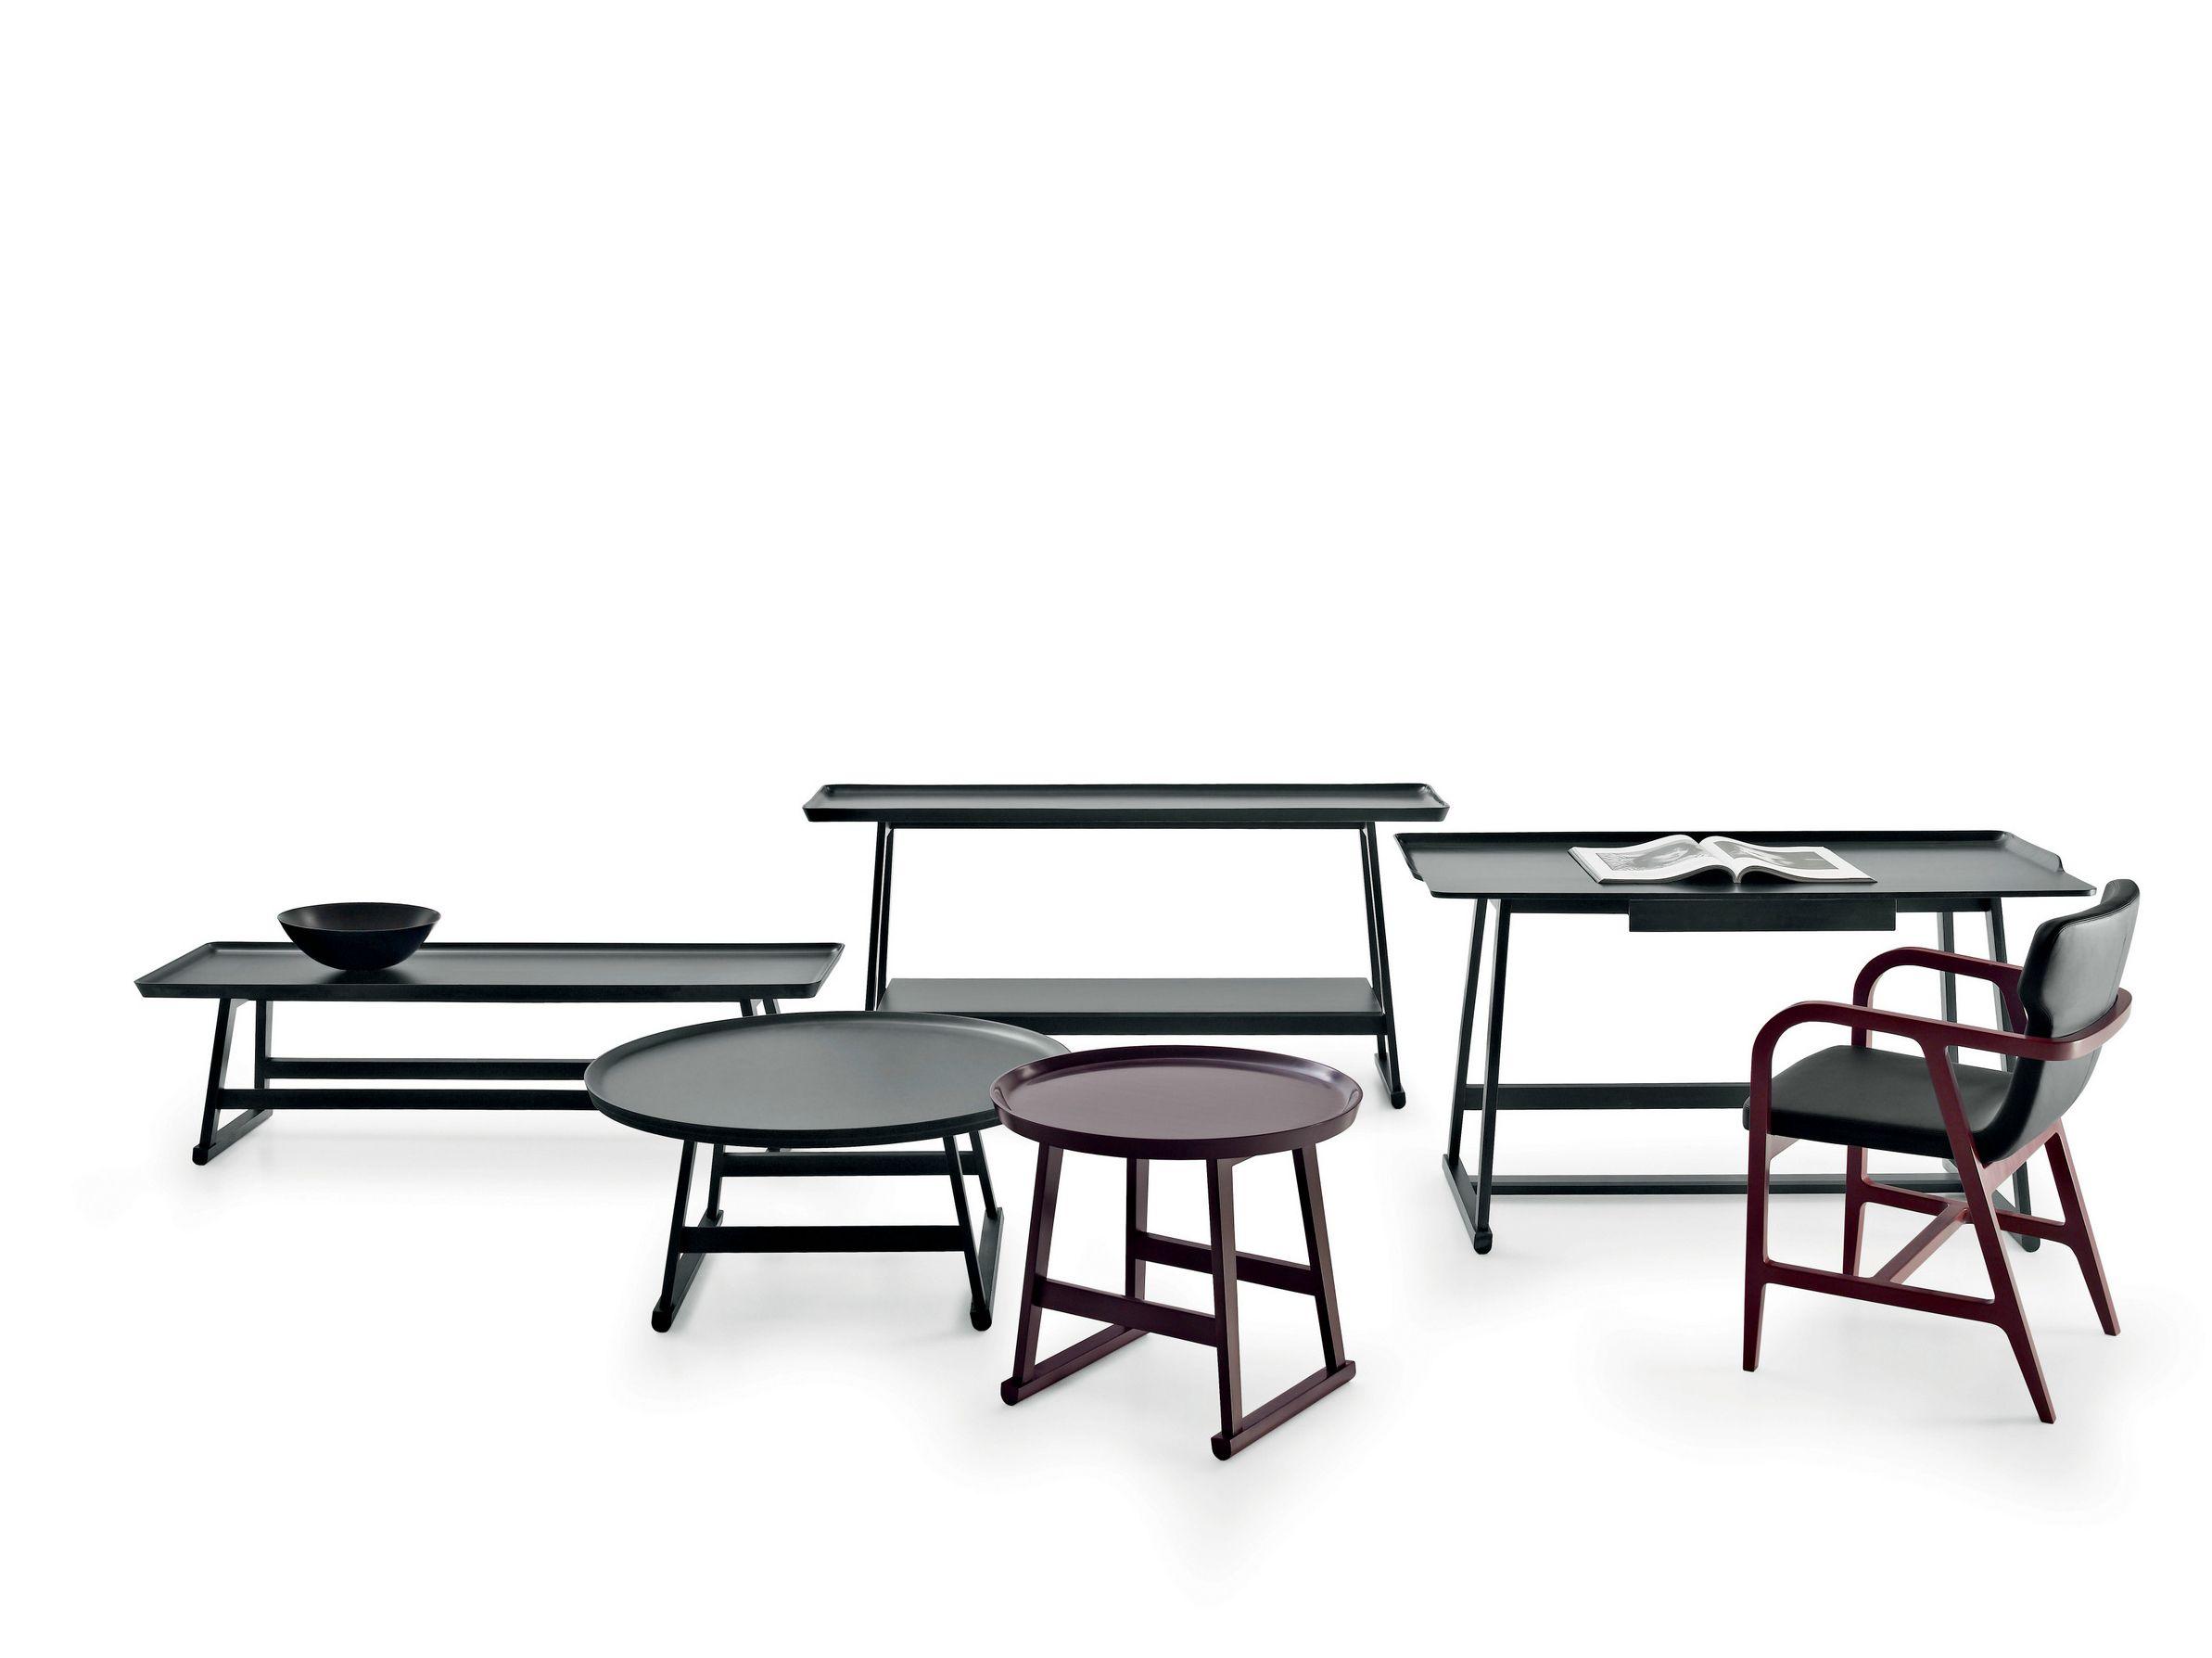 Recipio 39 14 Rectangular Coffee Table By Maxalto A Brand Of B B Italia Spa Design Antonio Citterio